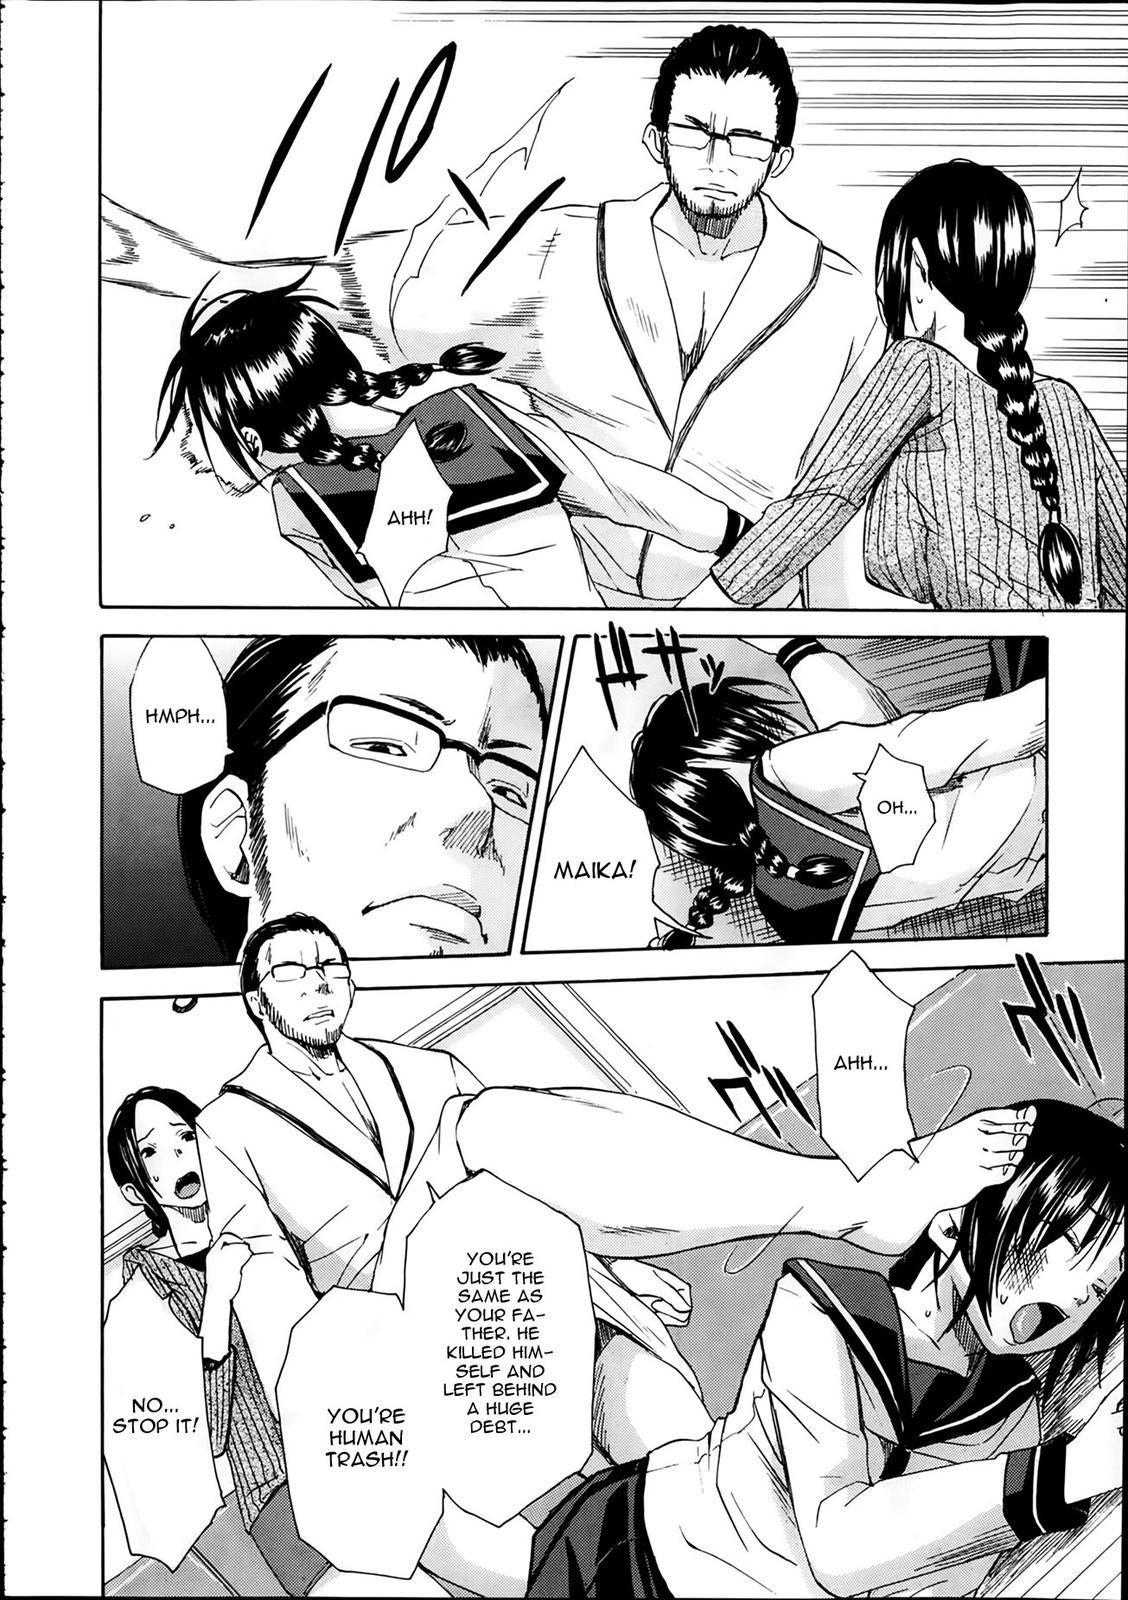 [Chiyou Yoyuchi] Rinkan Gakuen ~Haibokusha-tachi wa Midaremau~   Gang Rape School: The Losers Dance Indecently [English] 68